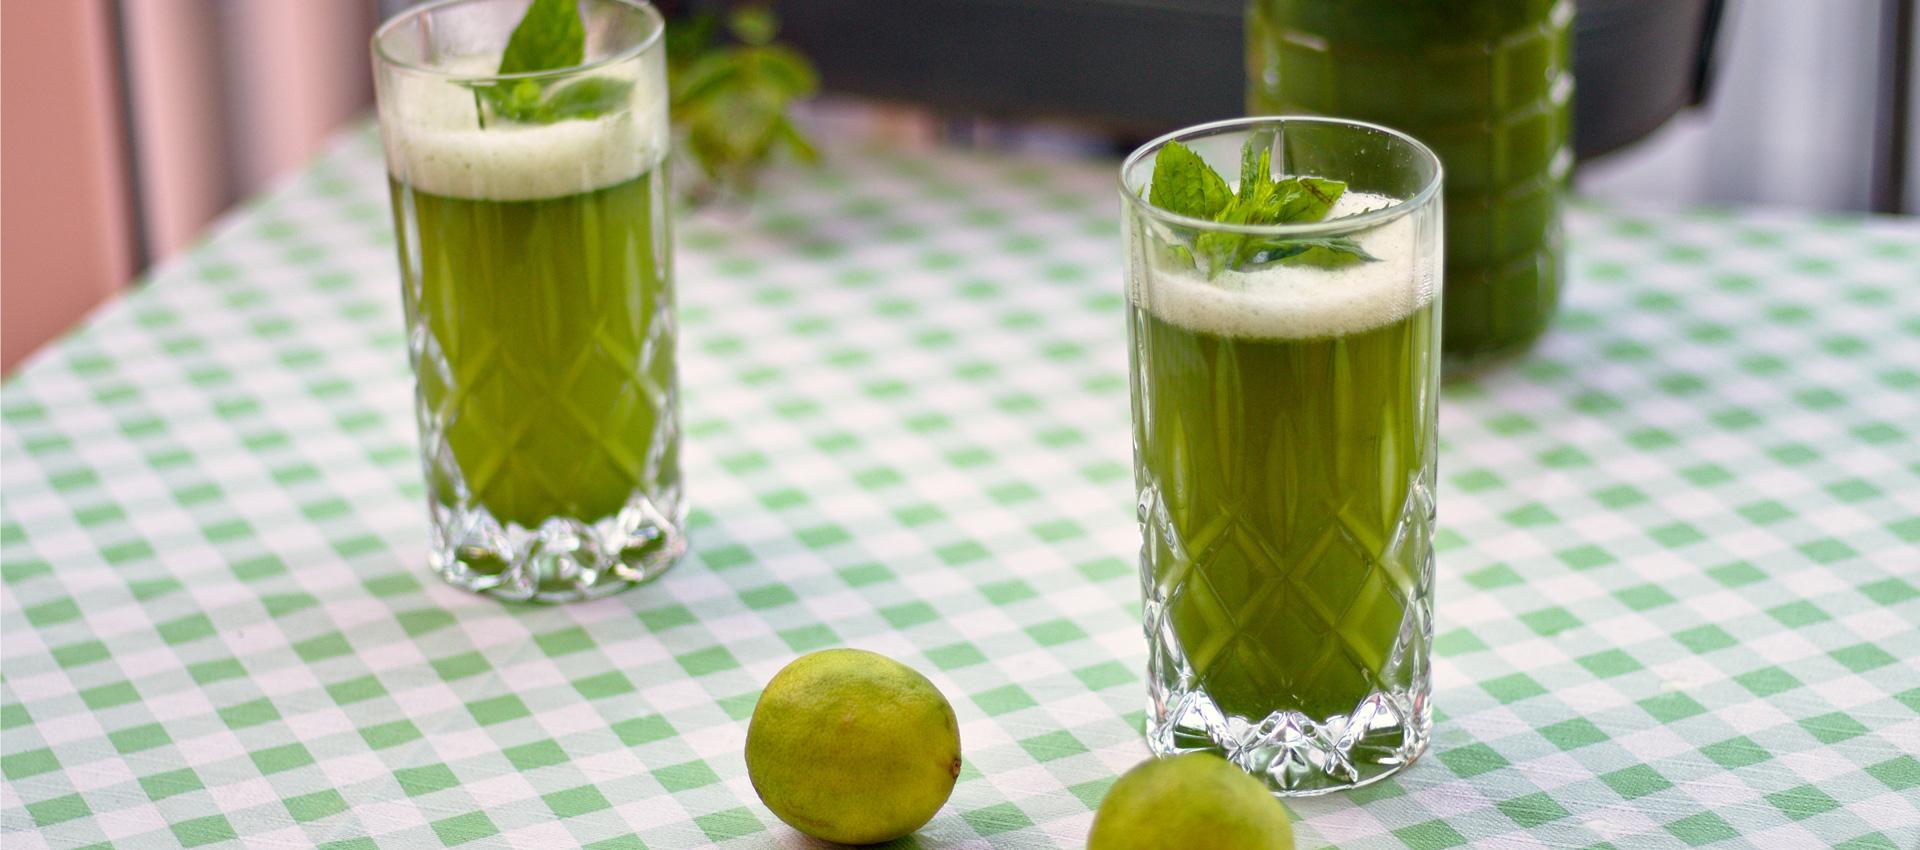 Rezept für Limetten-Minz-Limonana